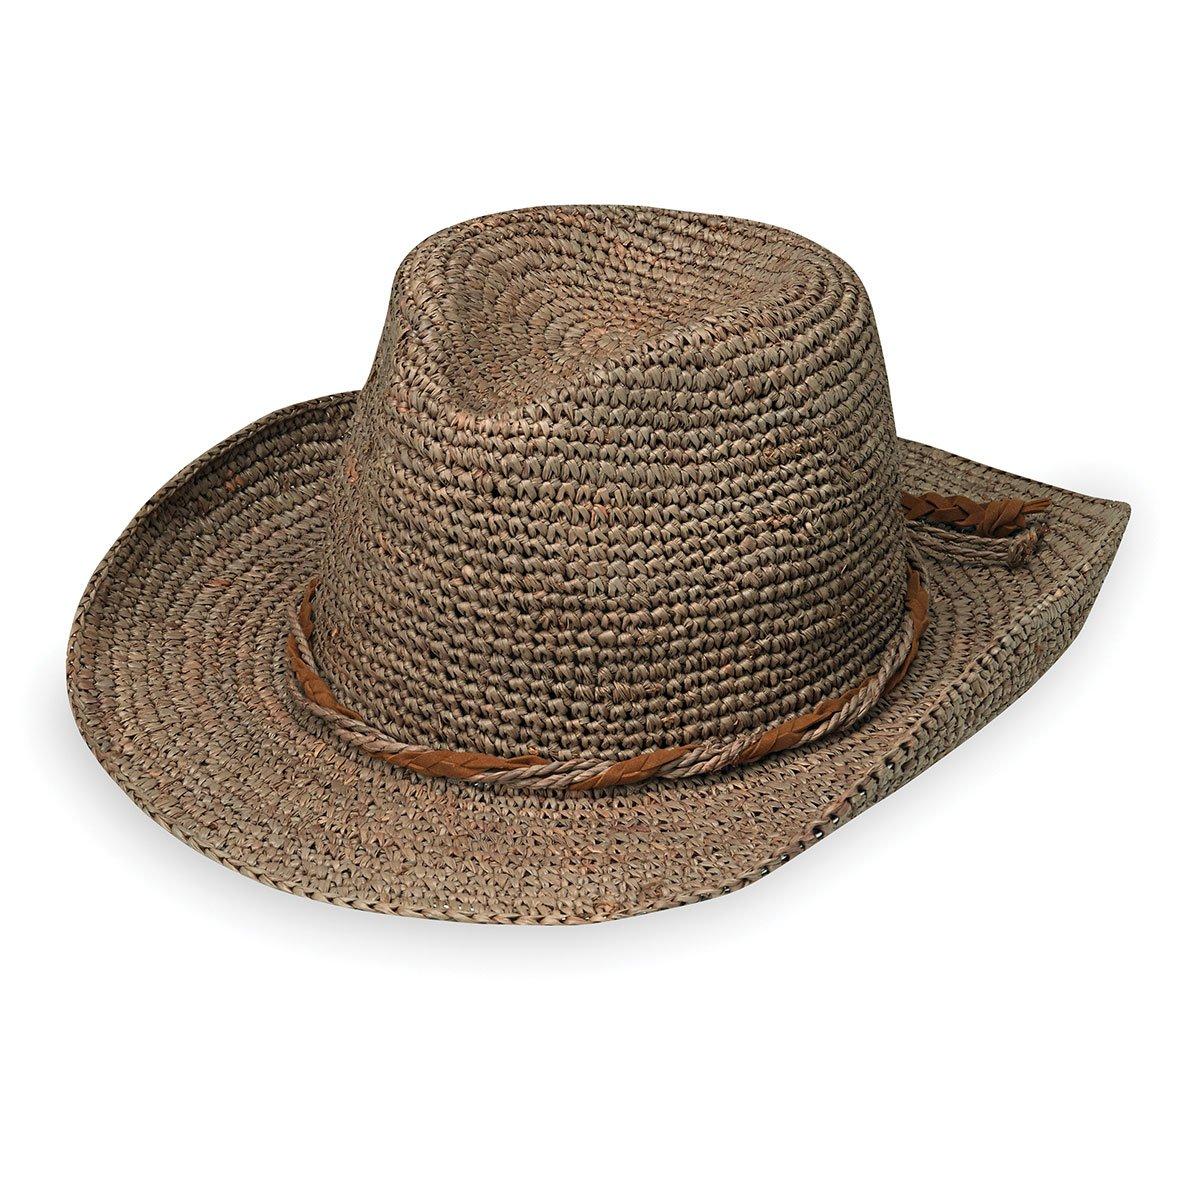 Wallaroo Hat Company Women's Hailey Cowboy Hat - Raffia, Modern Cowboy, Designed in Australia, Mushroom by Wallaroo Hat Company